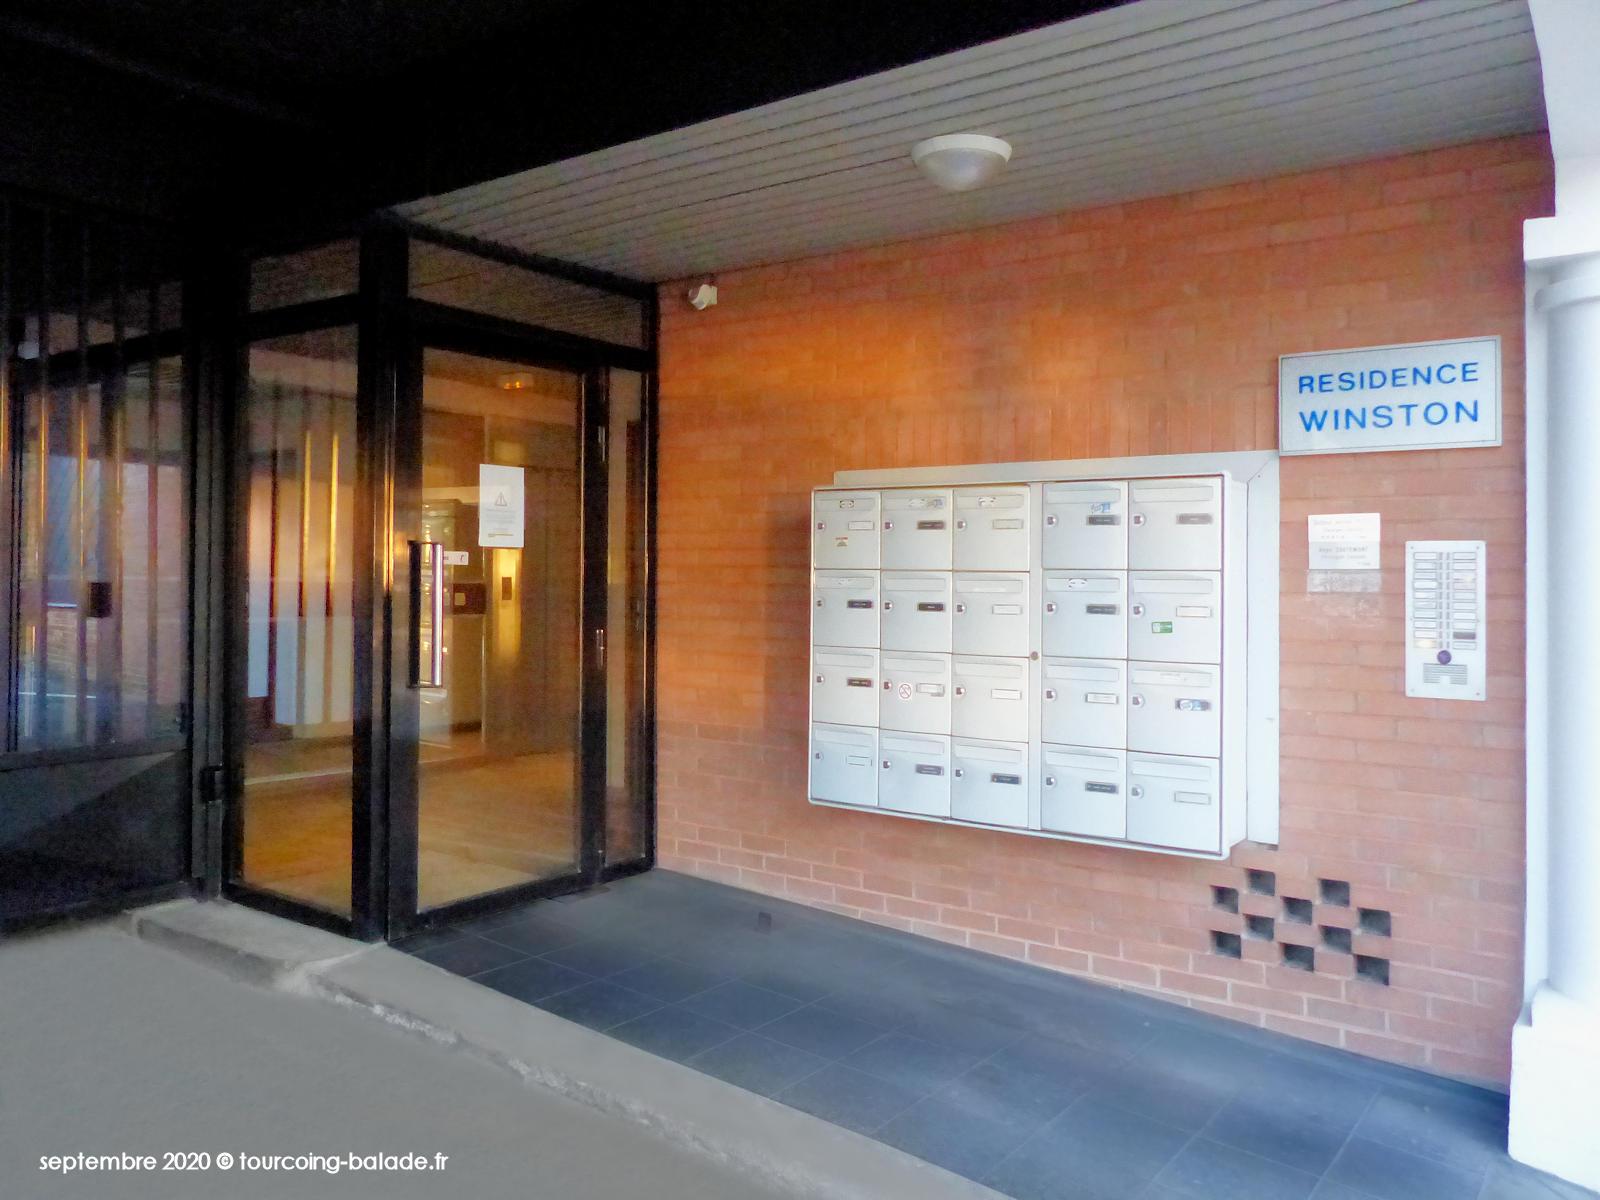 Résidence Winston Tourcoing 2020 - Sas d'entrée